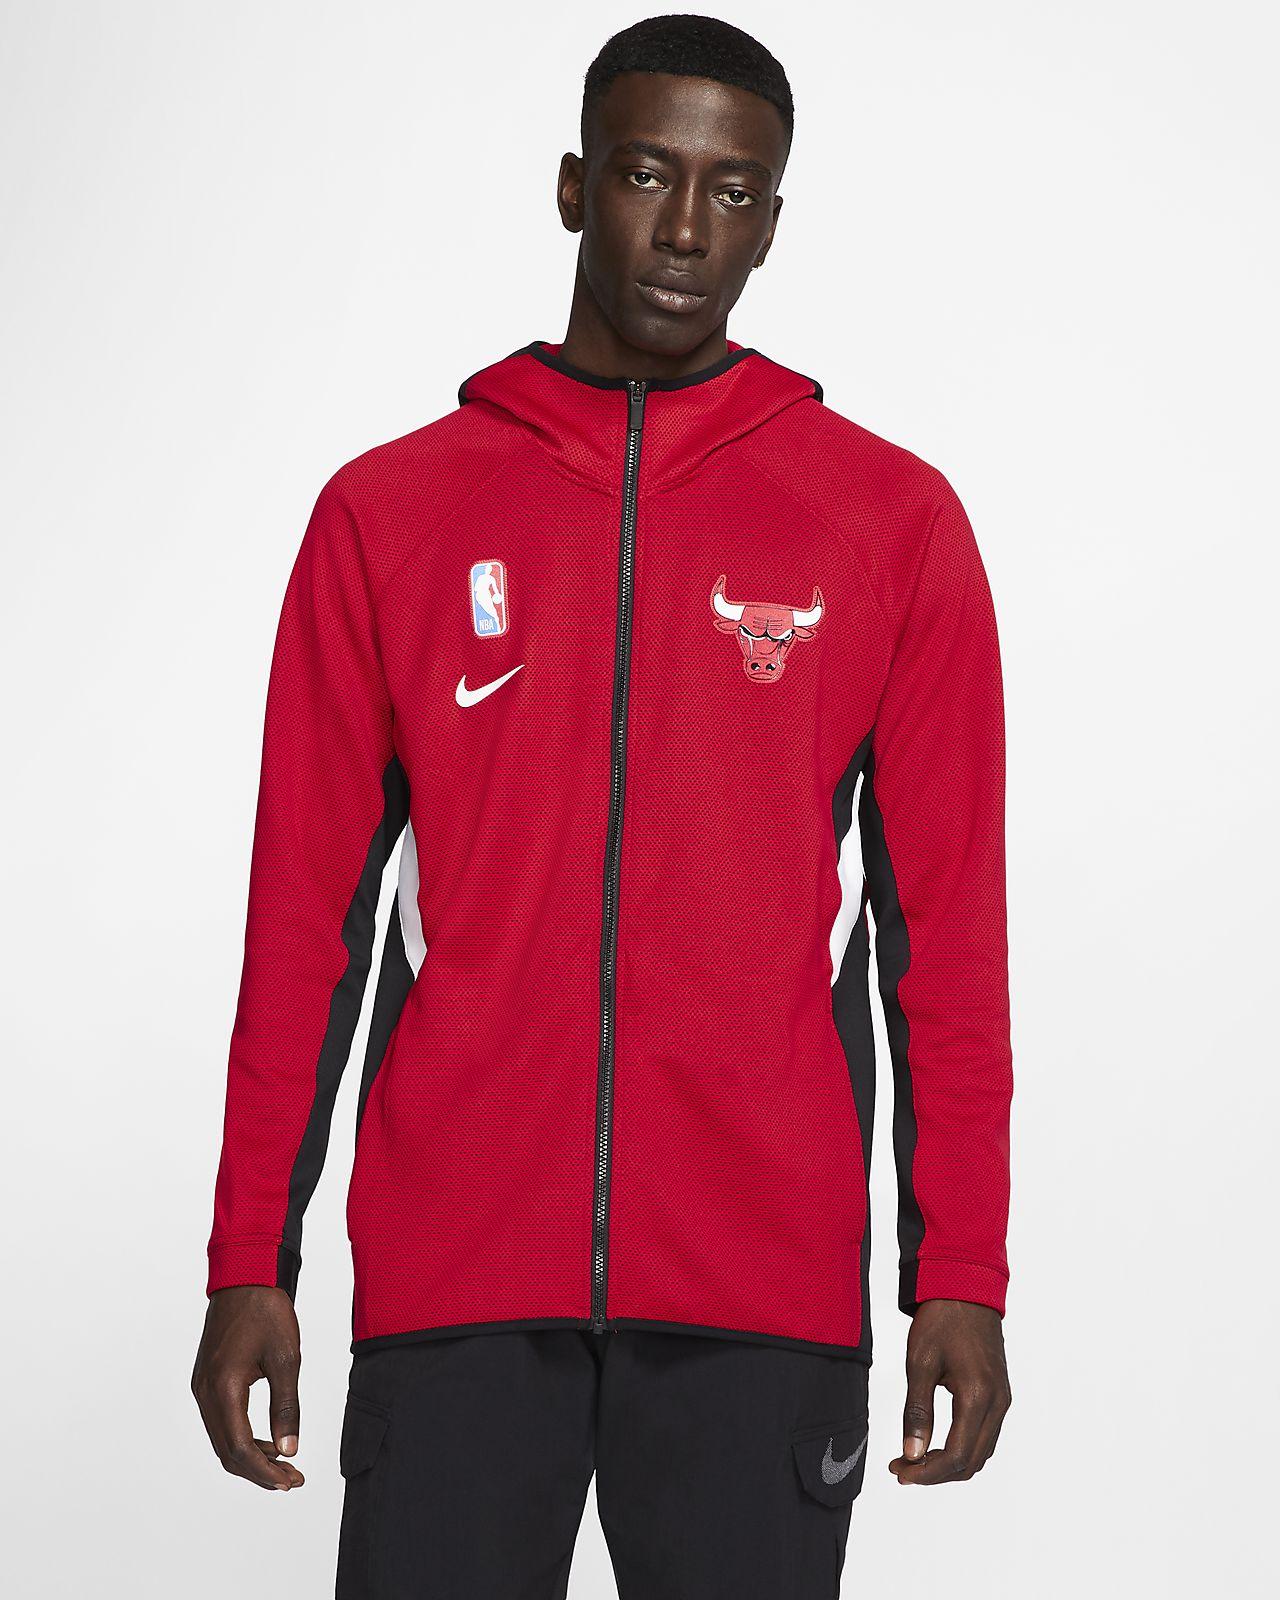 Sudadera con capucha de NBA para hombre Chicago Bulls Nike Therma Flex Showtime